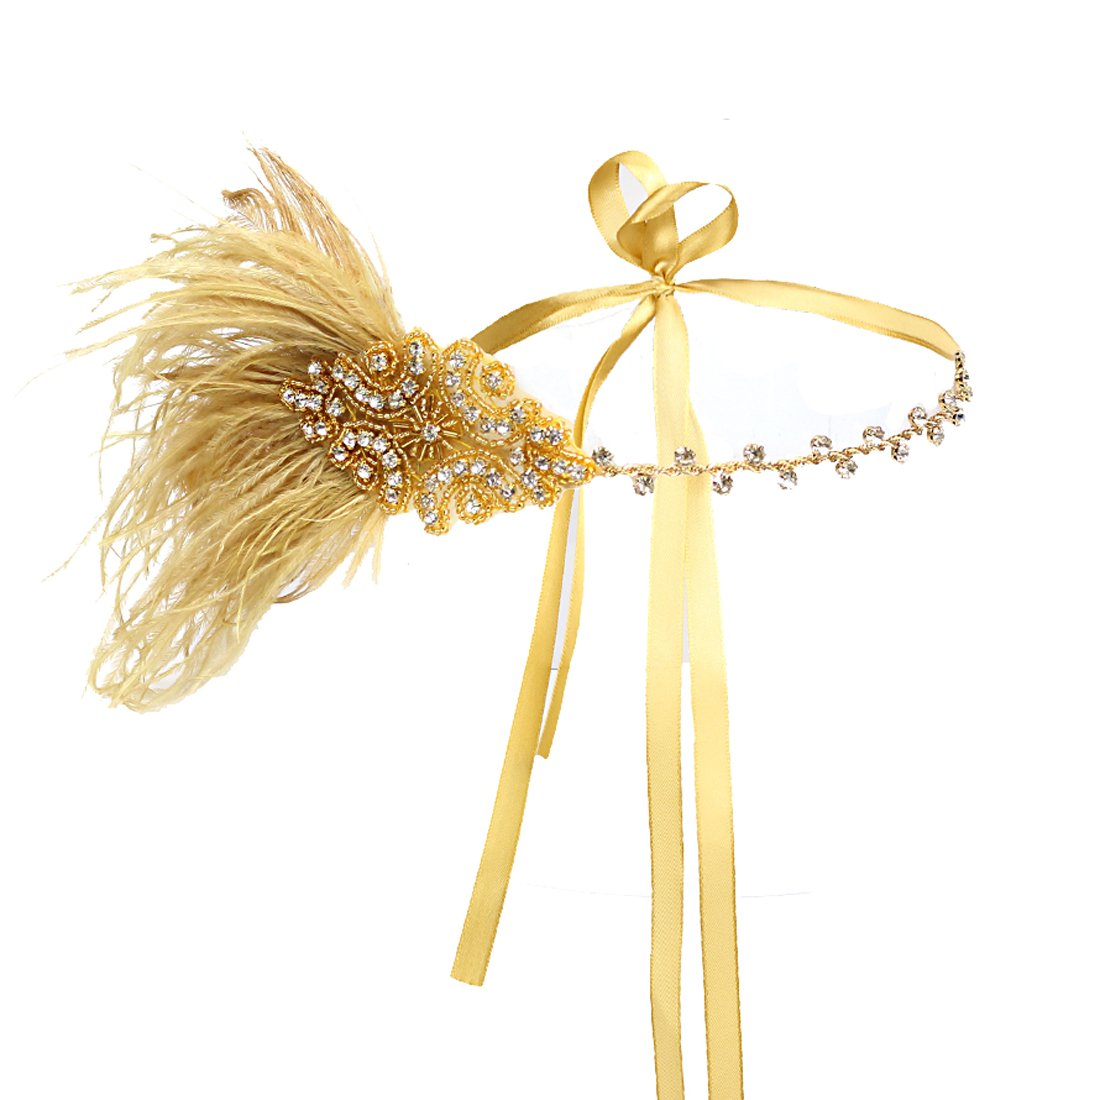 JaosWish Vintage oro aleta diadema 1920 Art Deco brillante diadema Gatsby pluma tocado